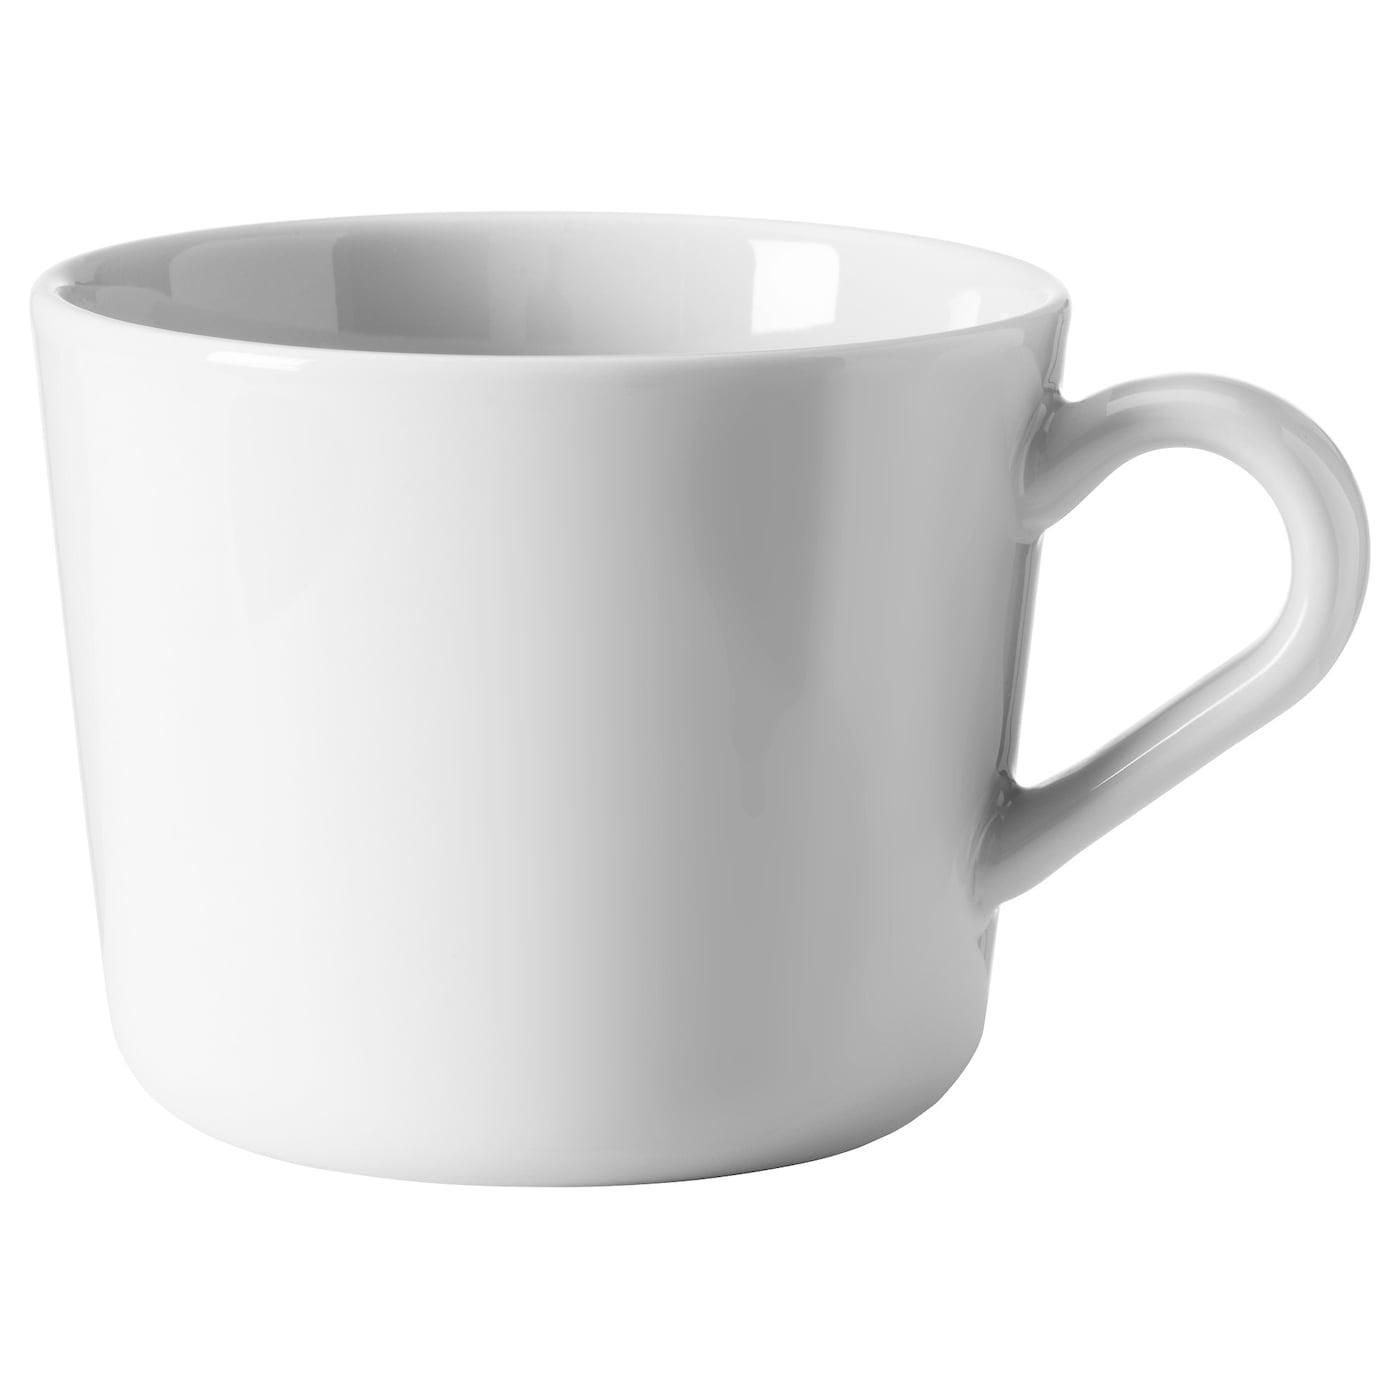 Ikea 365 Mug White 8 Oz